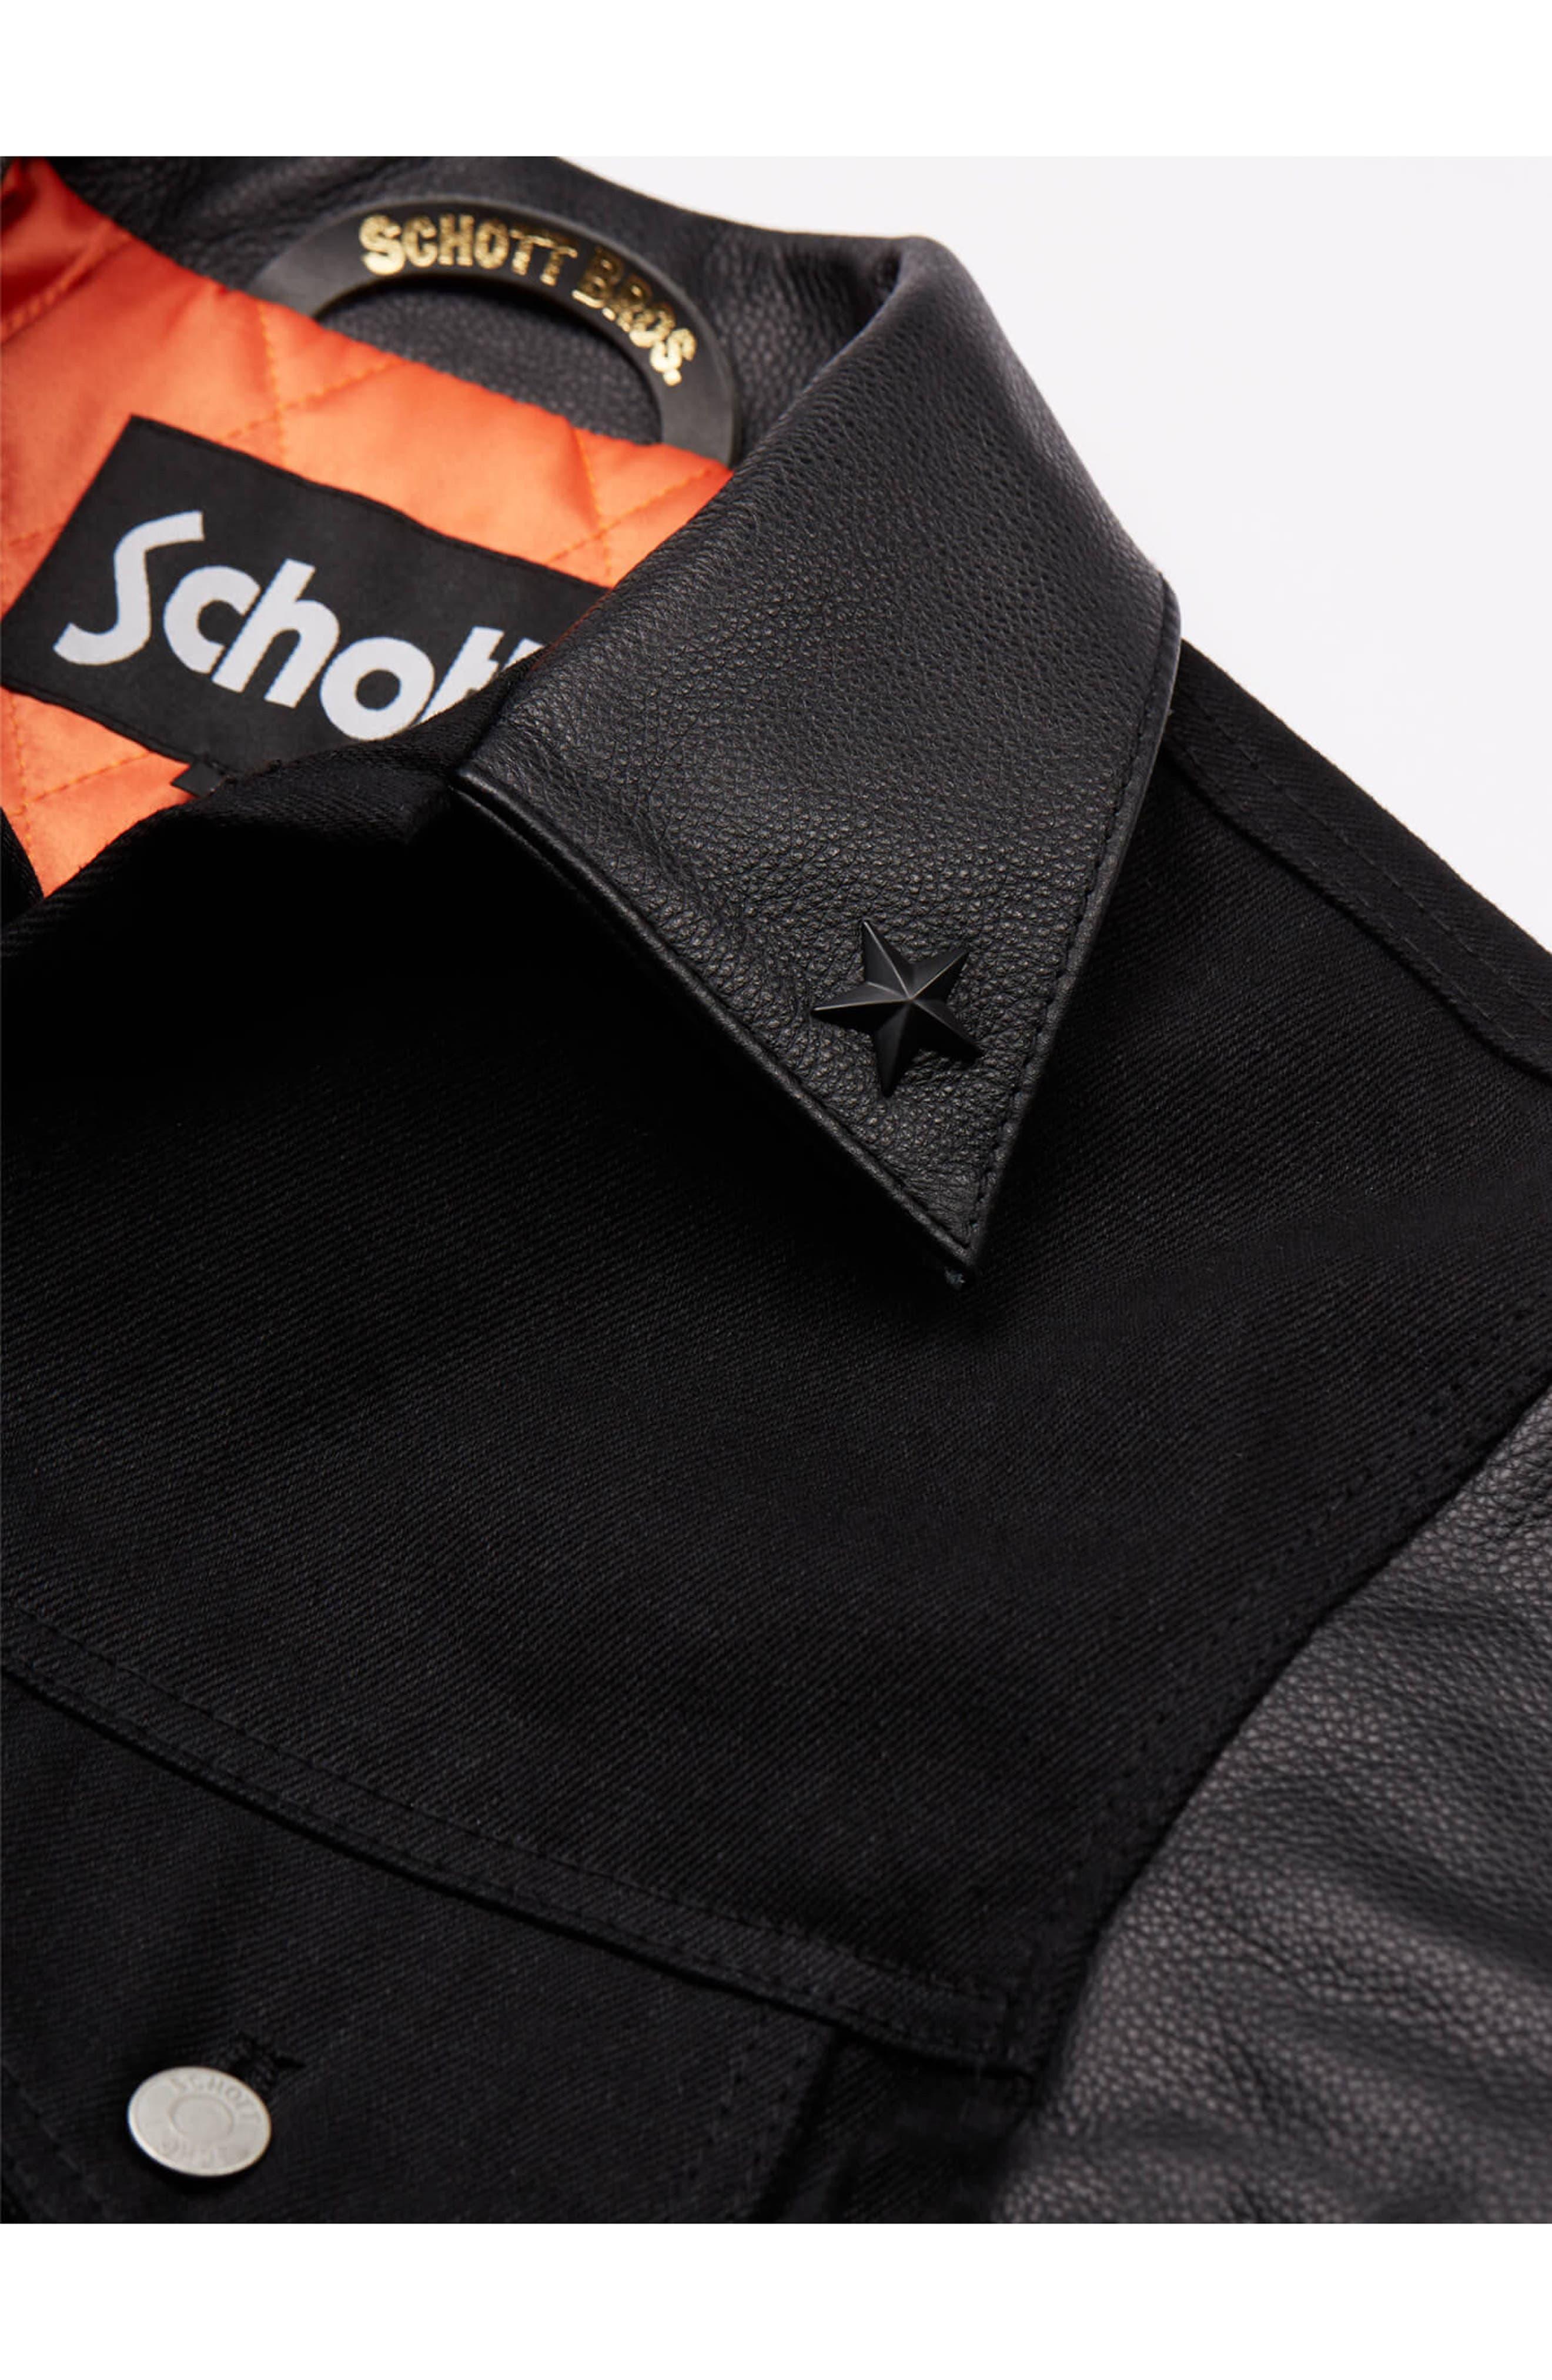 Alternate Image 3  - Volcom x Schott Denim Jacket (Limited Edition)